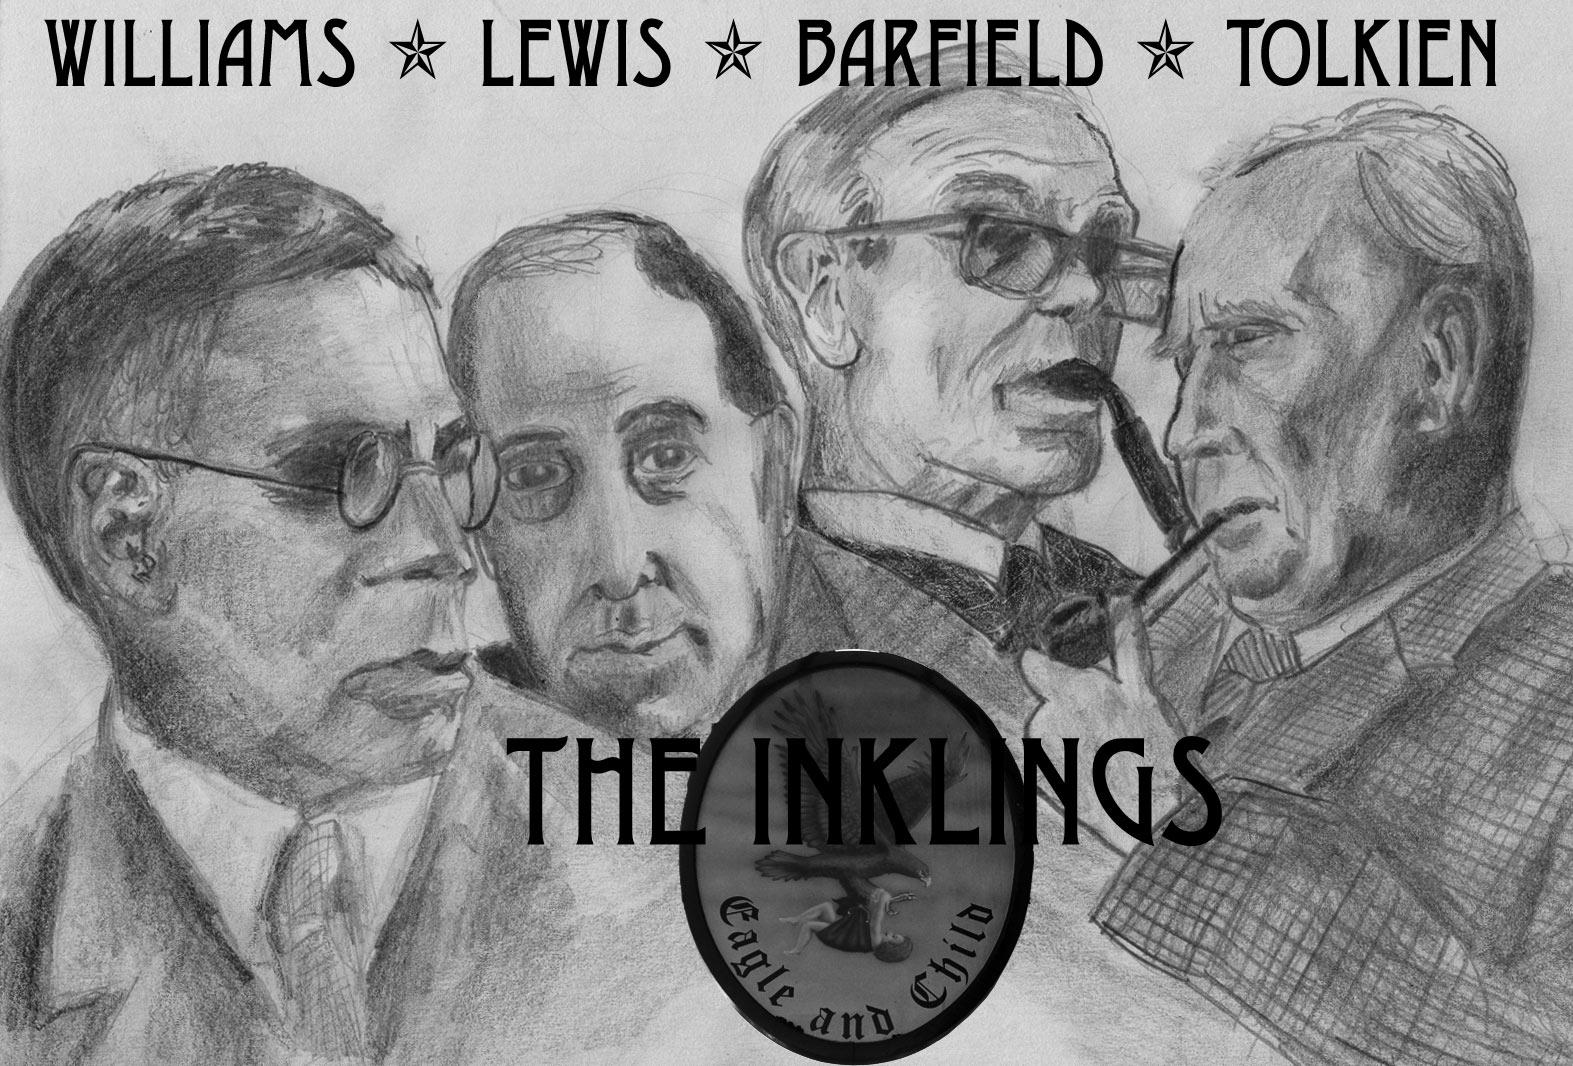 The Inklings: Charles Williams, C.S. Lewis, Owen Barfield, and J. R. R. Tolkien